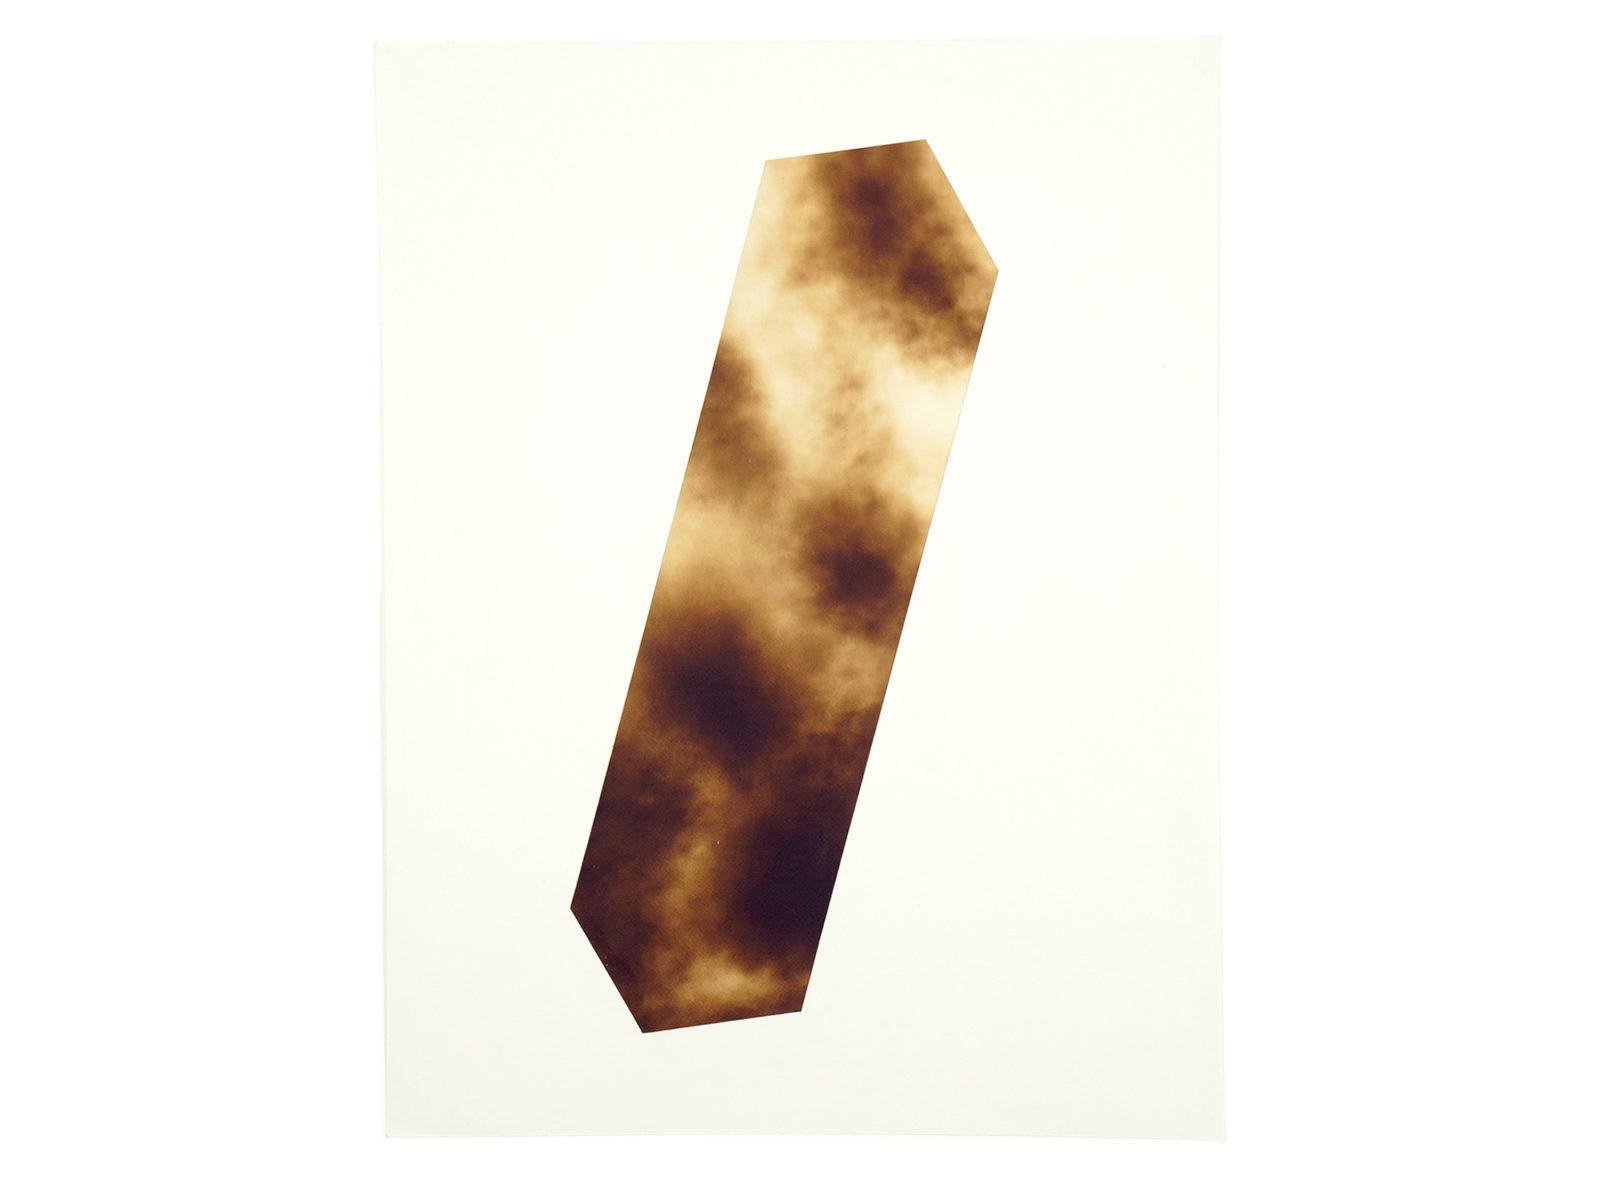 Benoit-Delaunay-artiste-dessins-2018-forme-01